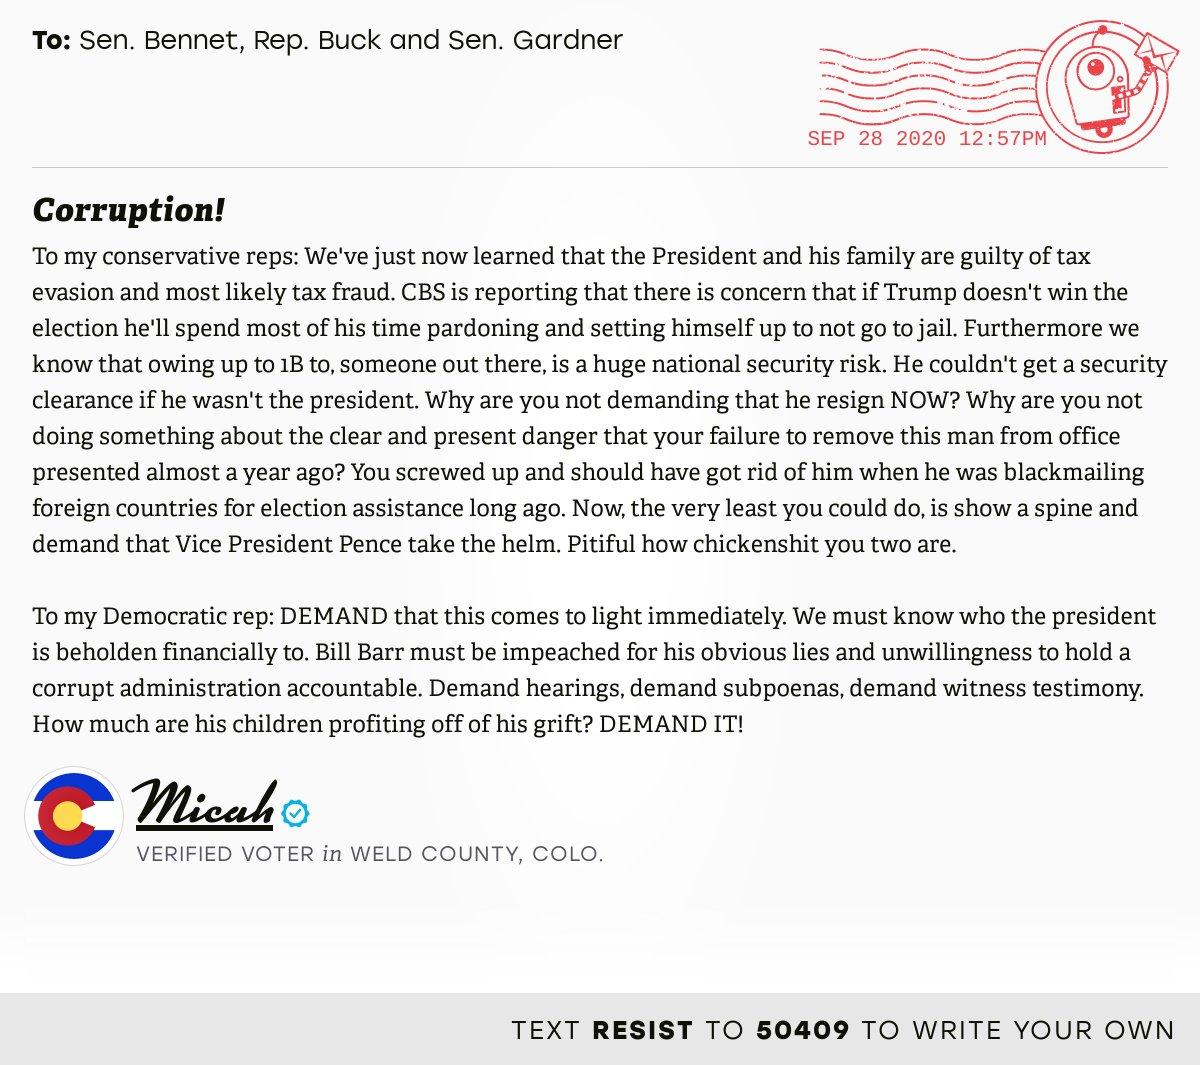 "📬 I delivered ""Corruption!"" from Micah, a 🗳 verified voter in Longmont, Colo., to @SenatorBennet, @RepKenBuck and @SenCoryGardner #CO04 #COpolitics  📝 Write your own: https://t.co/z5540KFSKD https://t.co/T2d31PR1ul"